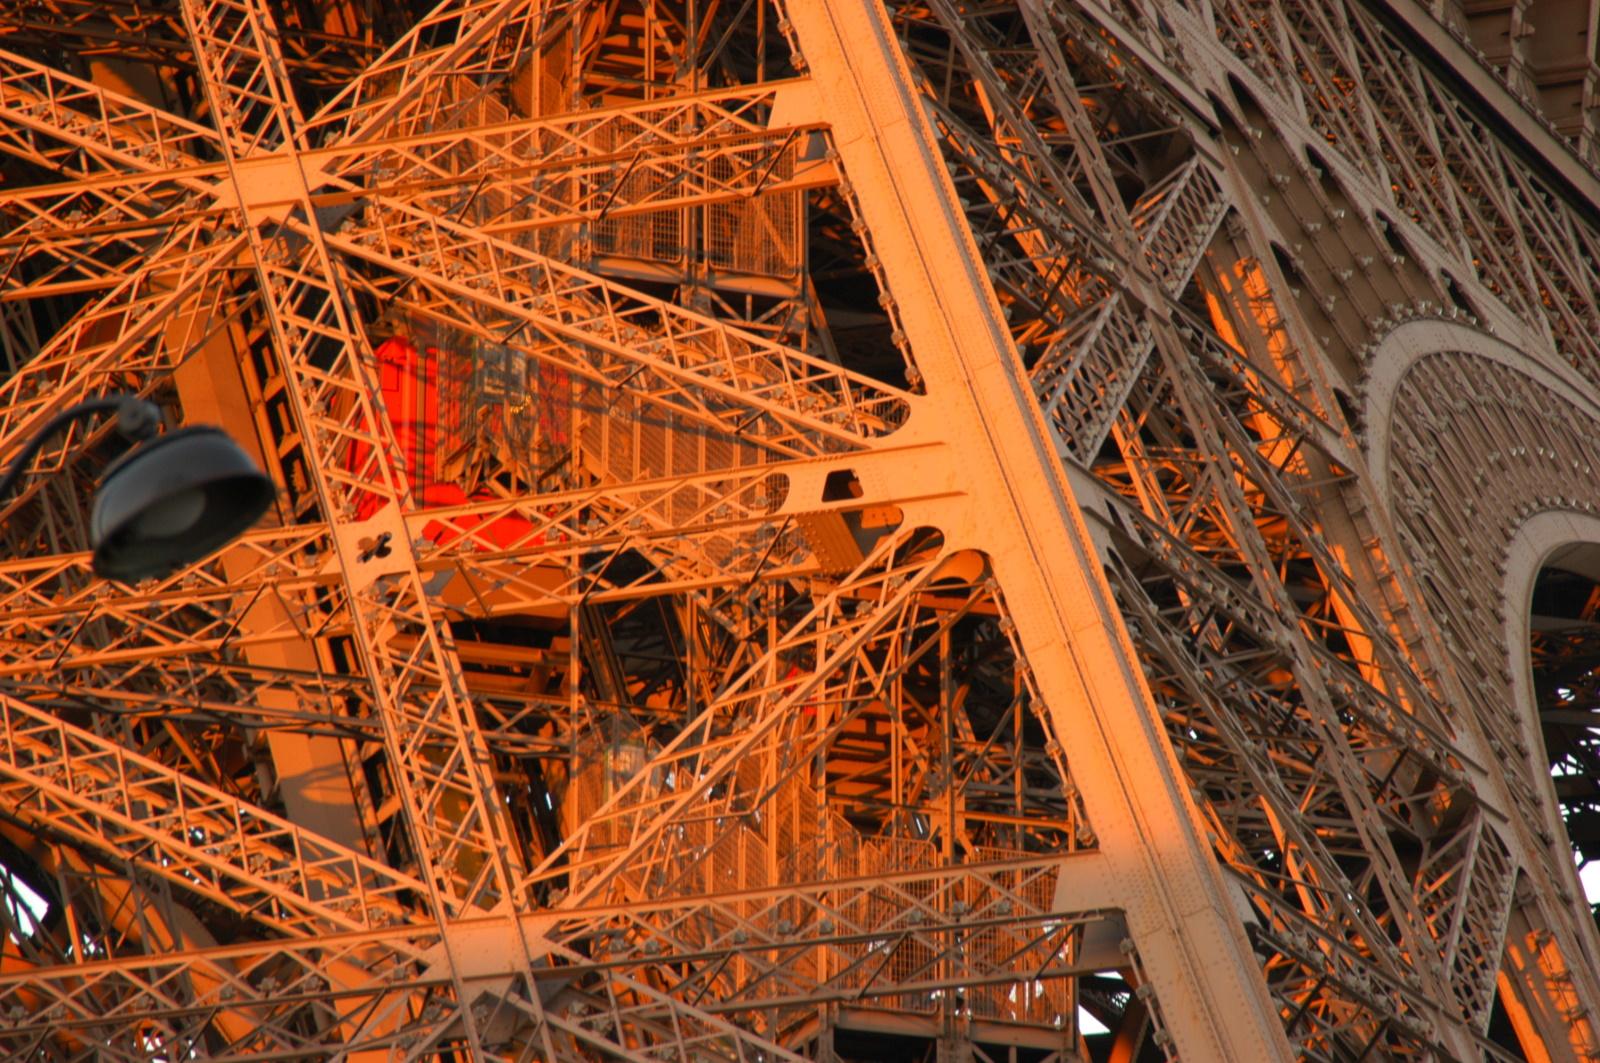 Eiffel Turm - Nahaufnahme - (c) Atout France - Hervé Le Gac